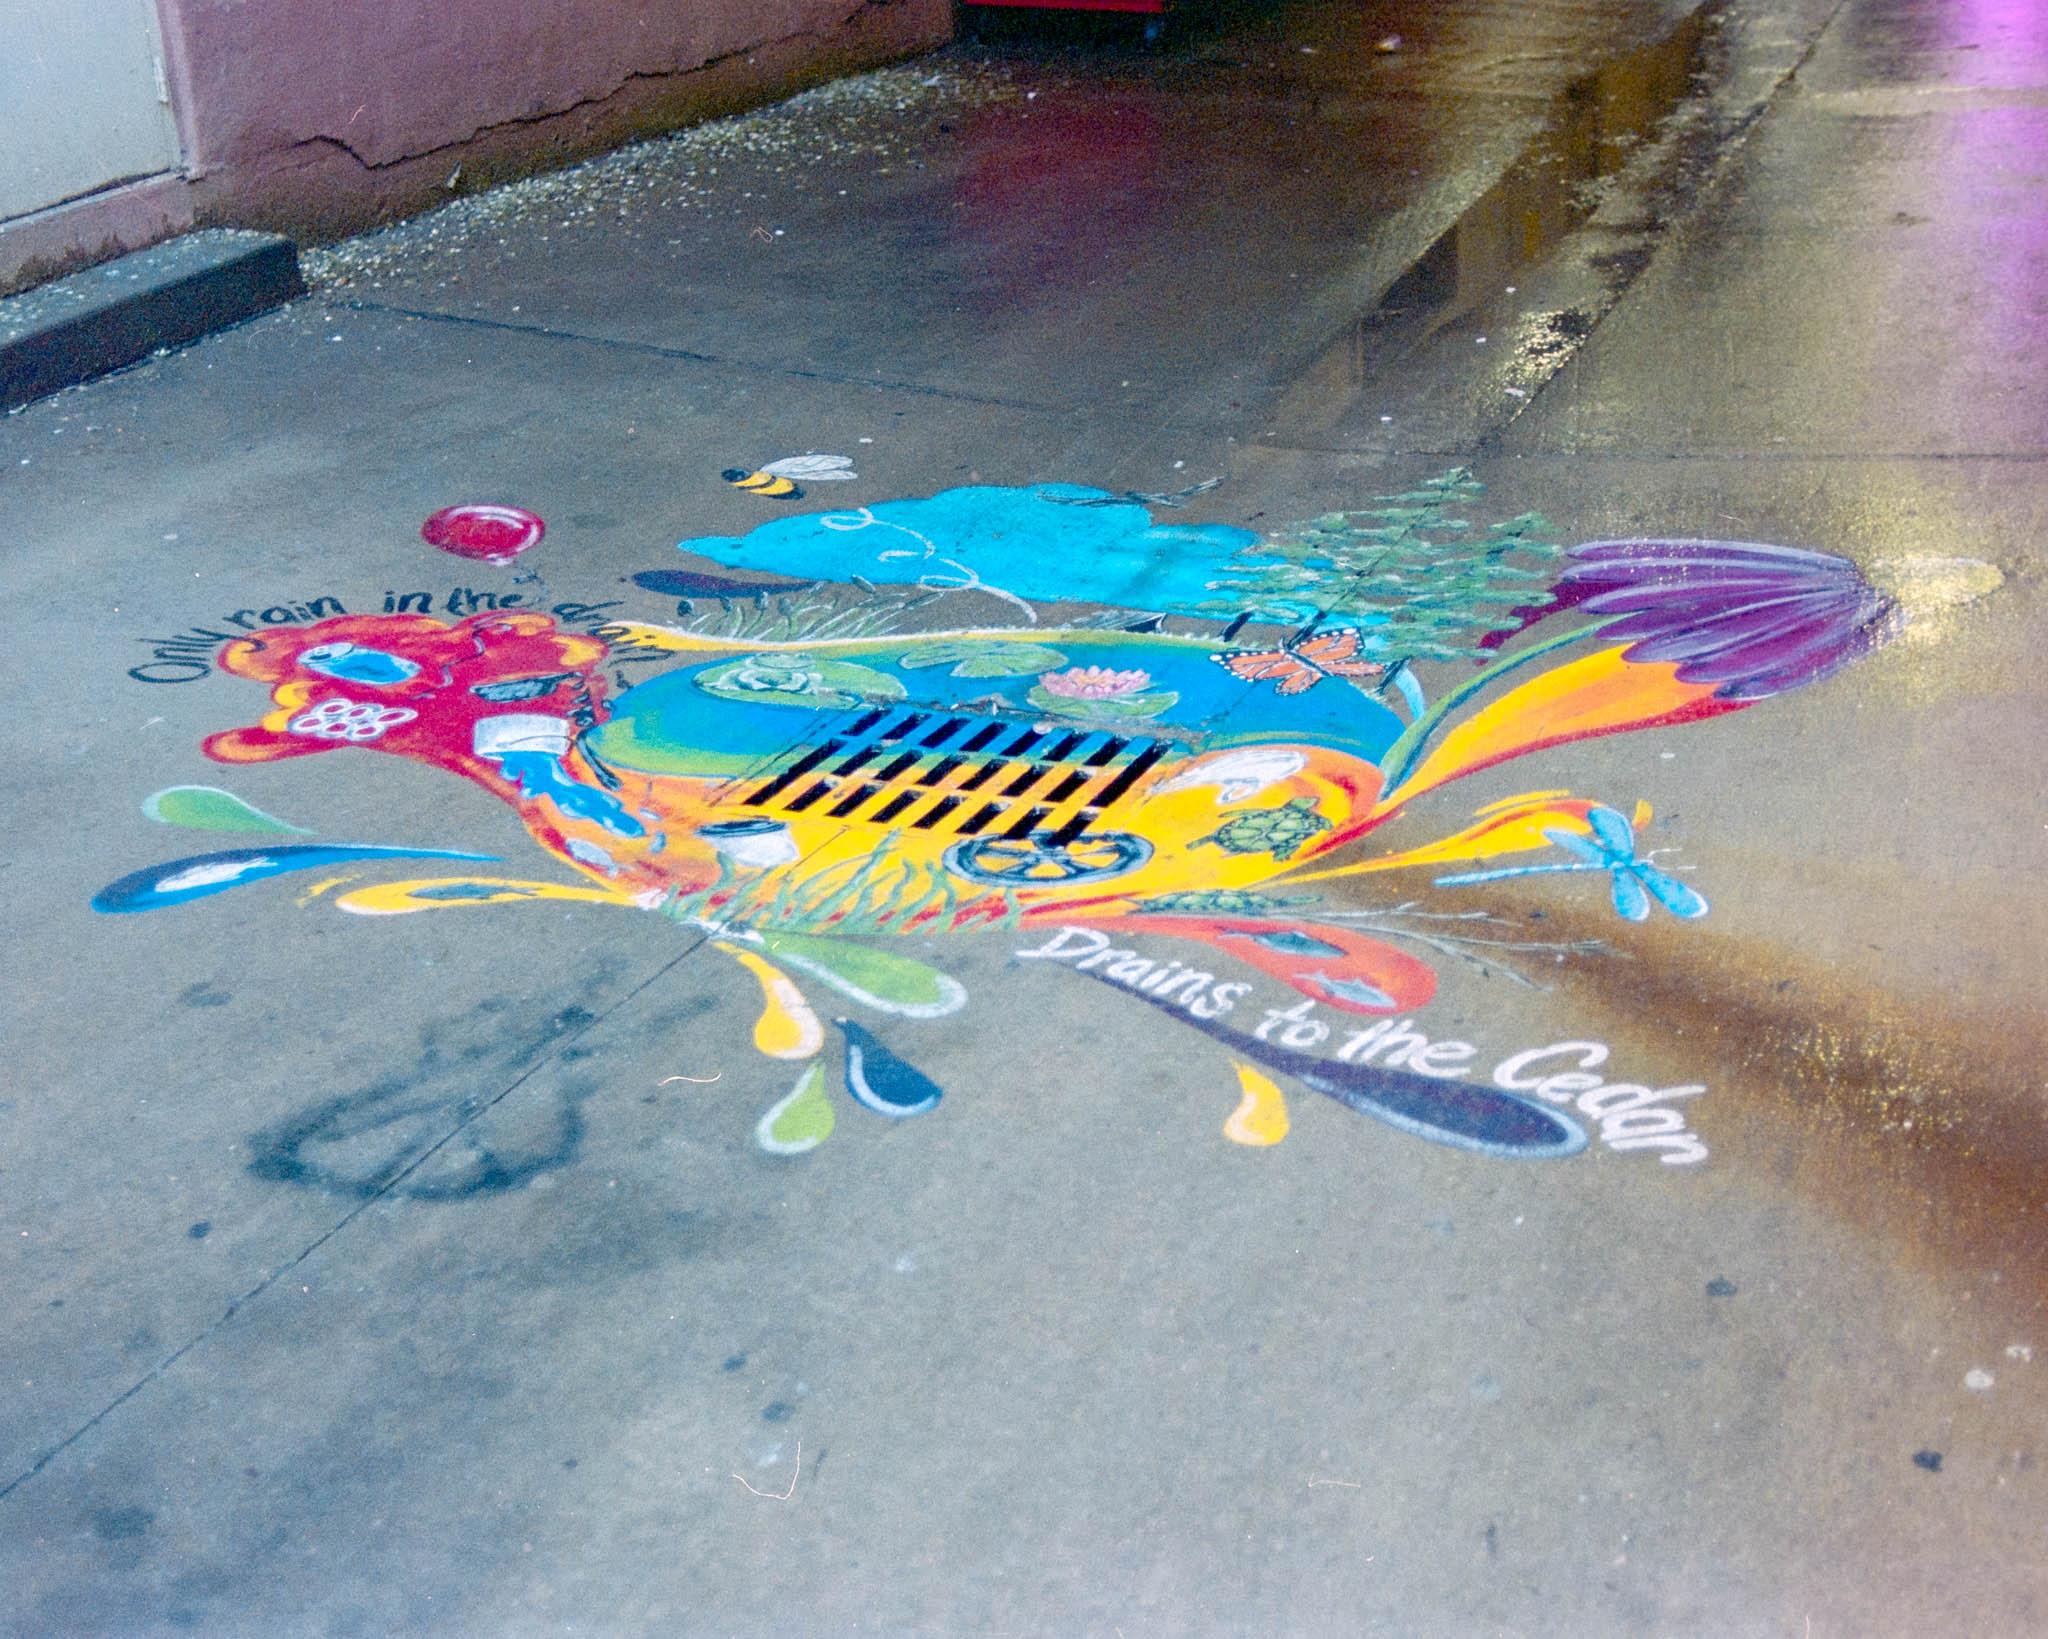 Alley artwork in downtown Cedar Rapids. Camera: Nikon N2020 with Fujifilm Superia 400